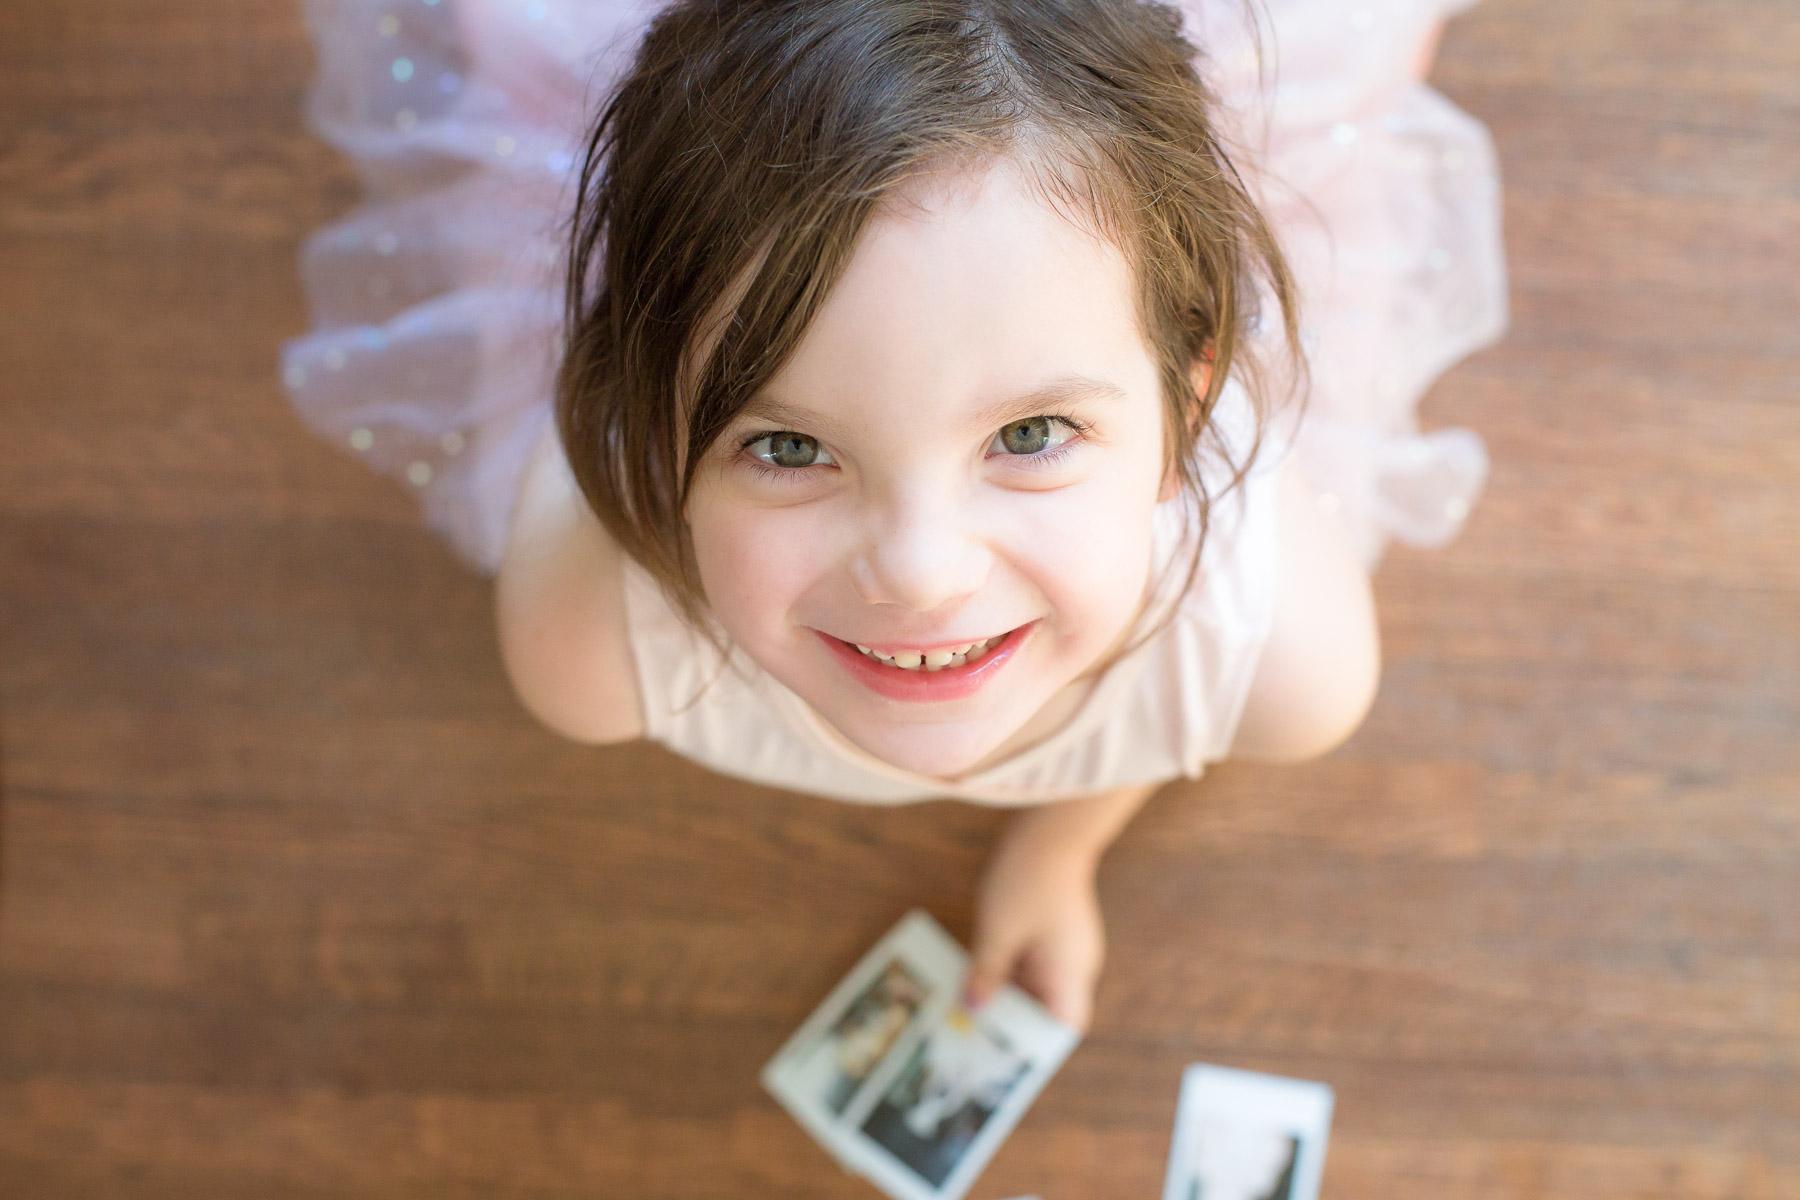 little-girl-looking-straigh-camera.jpg